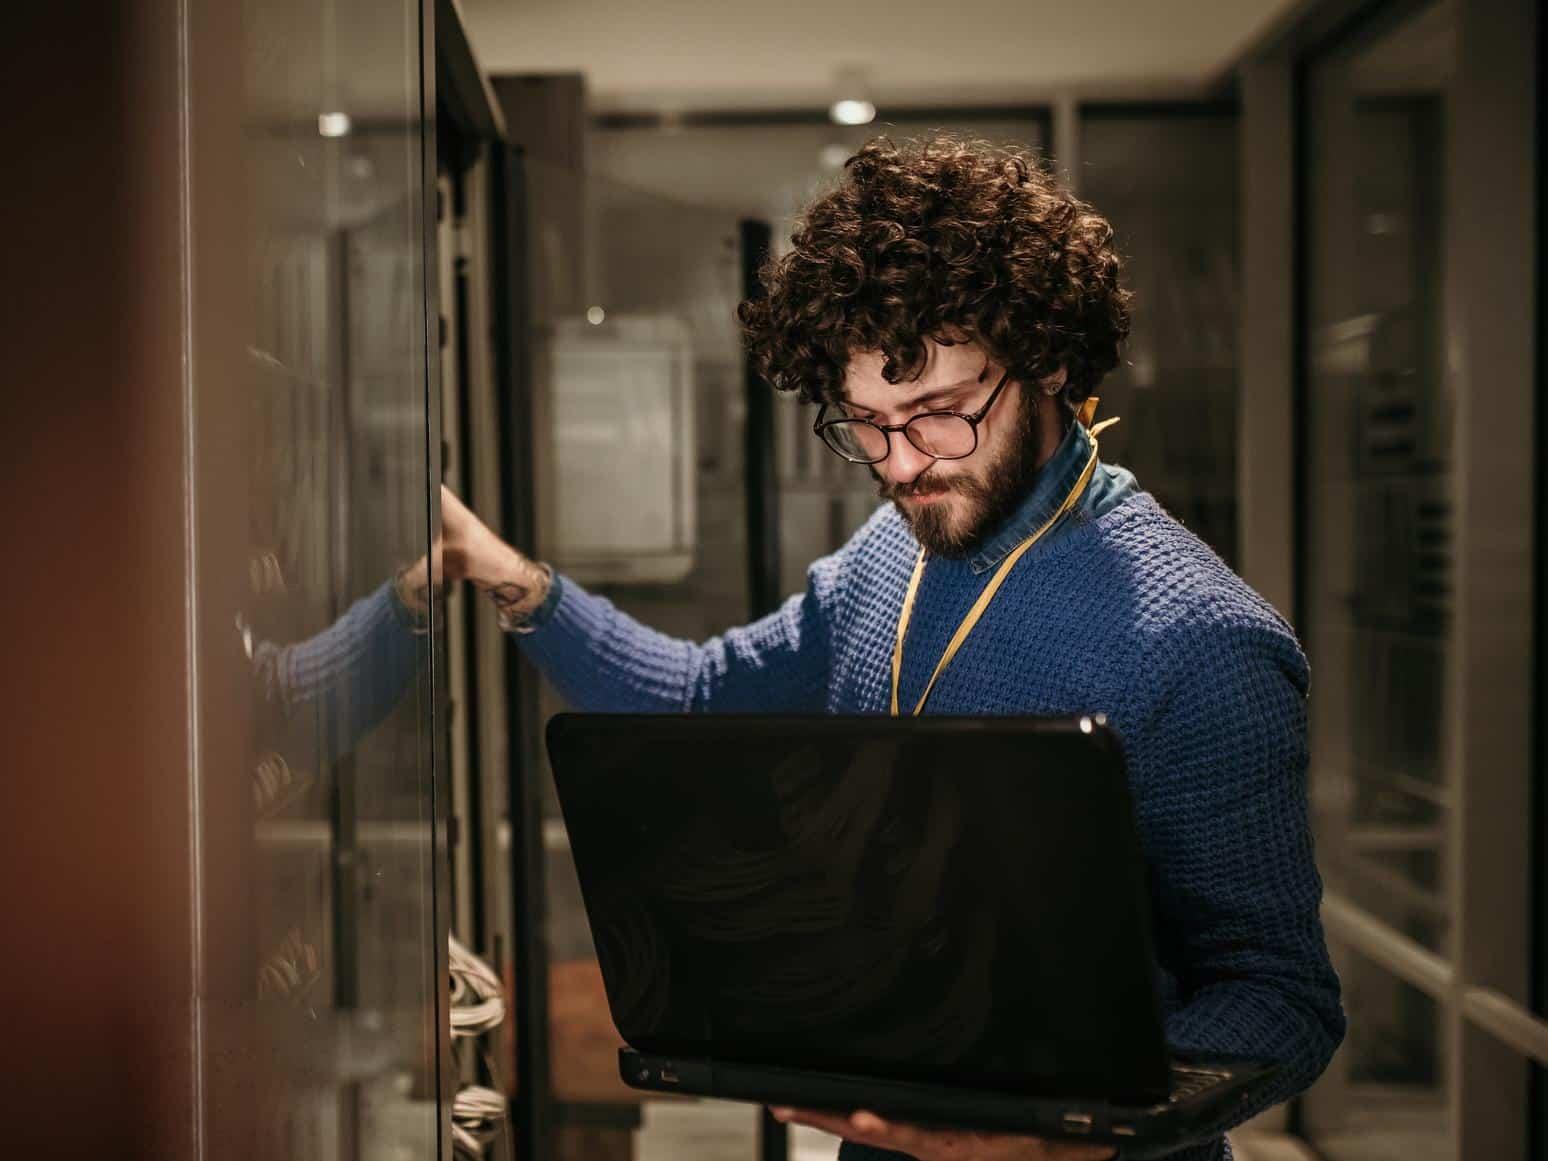 Curso Superior de Administración de redes con CCNA de Cisco